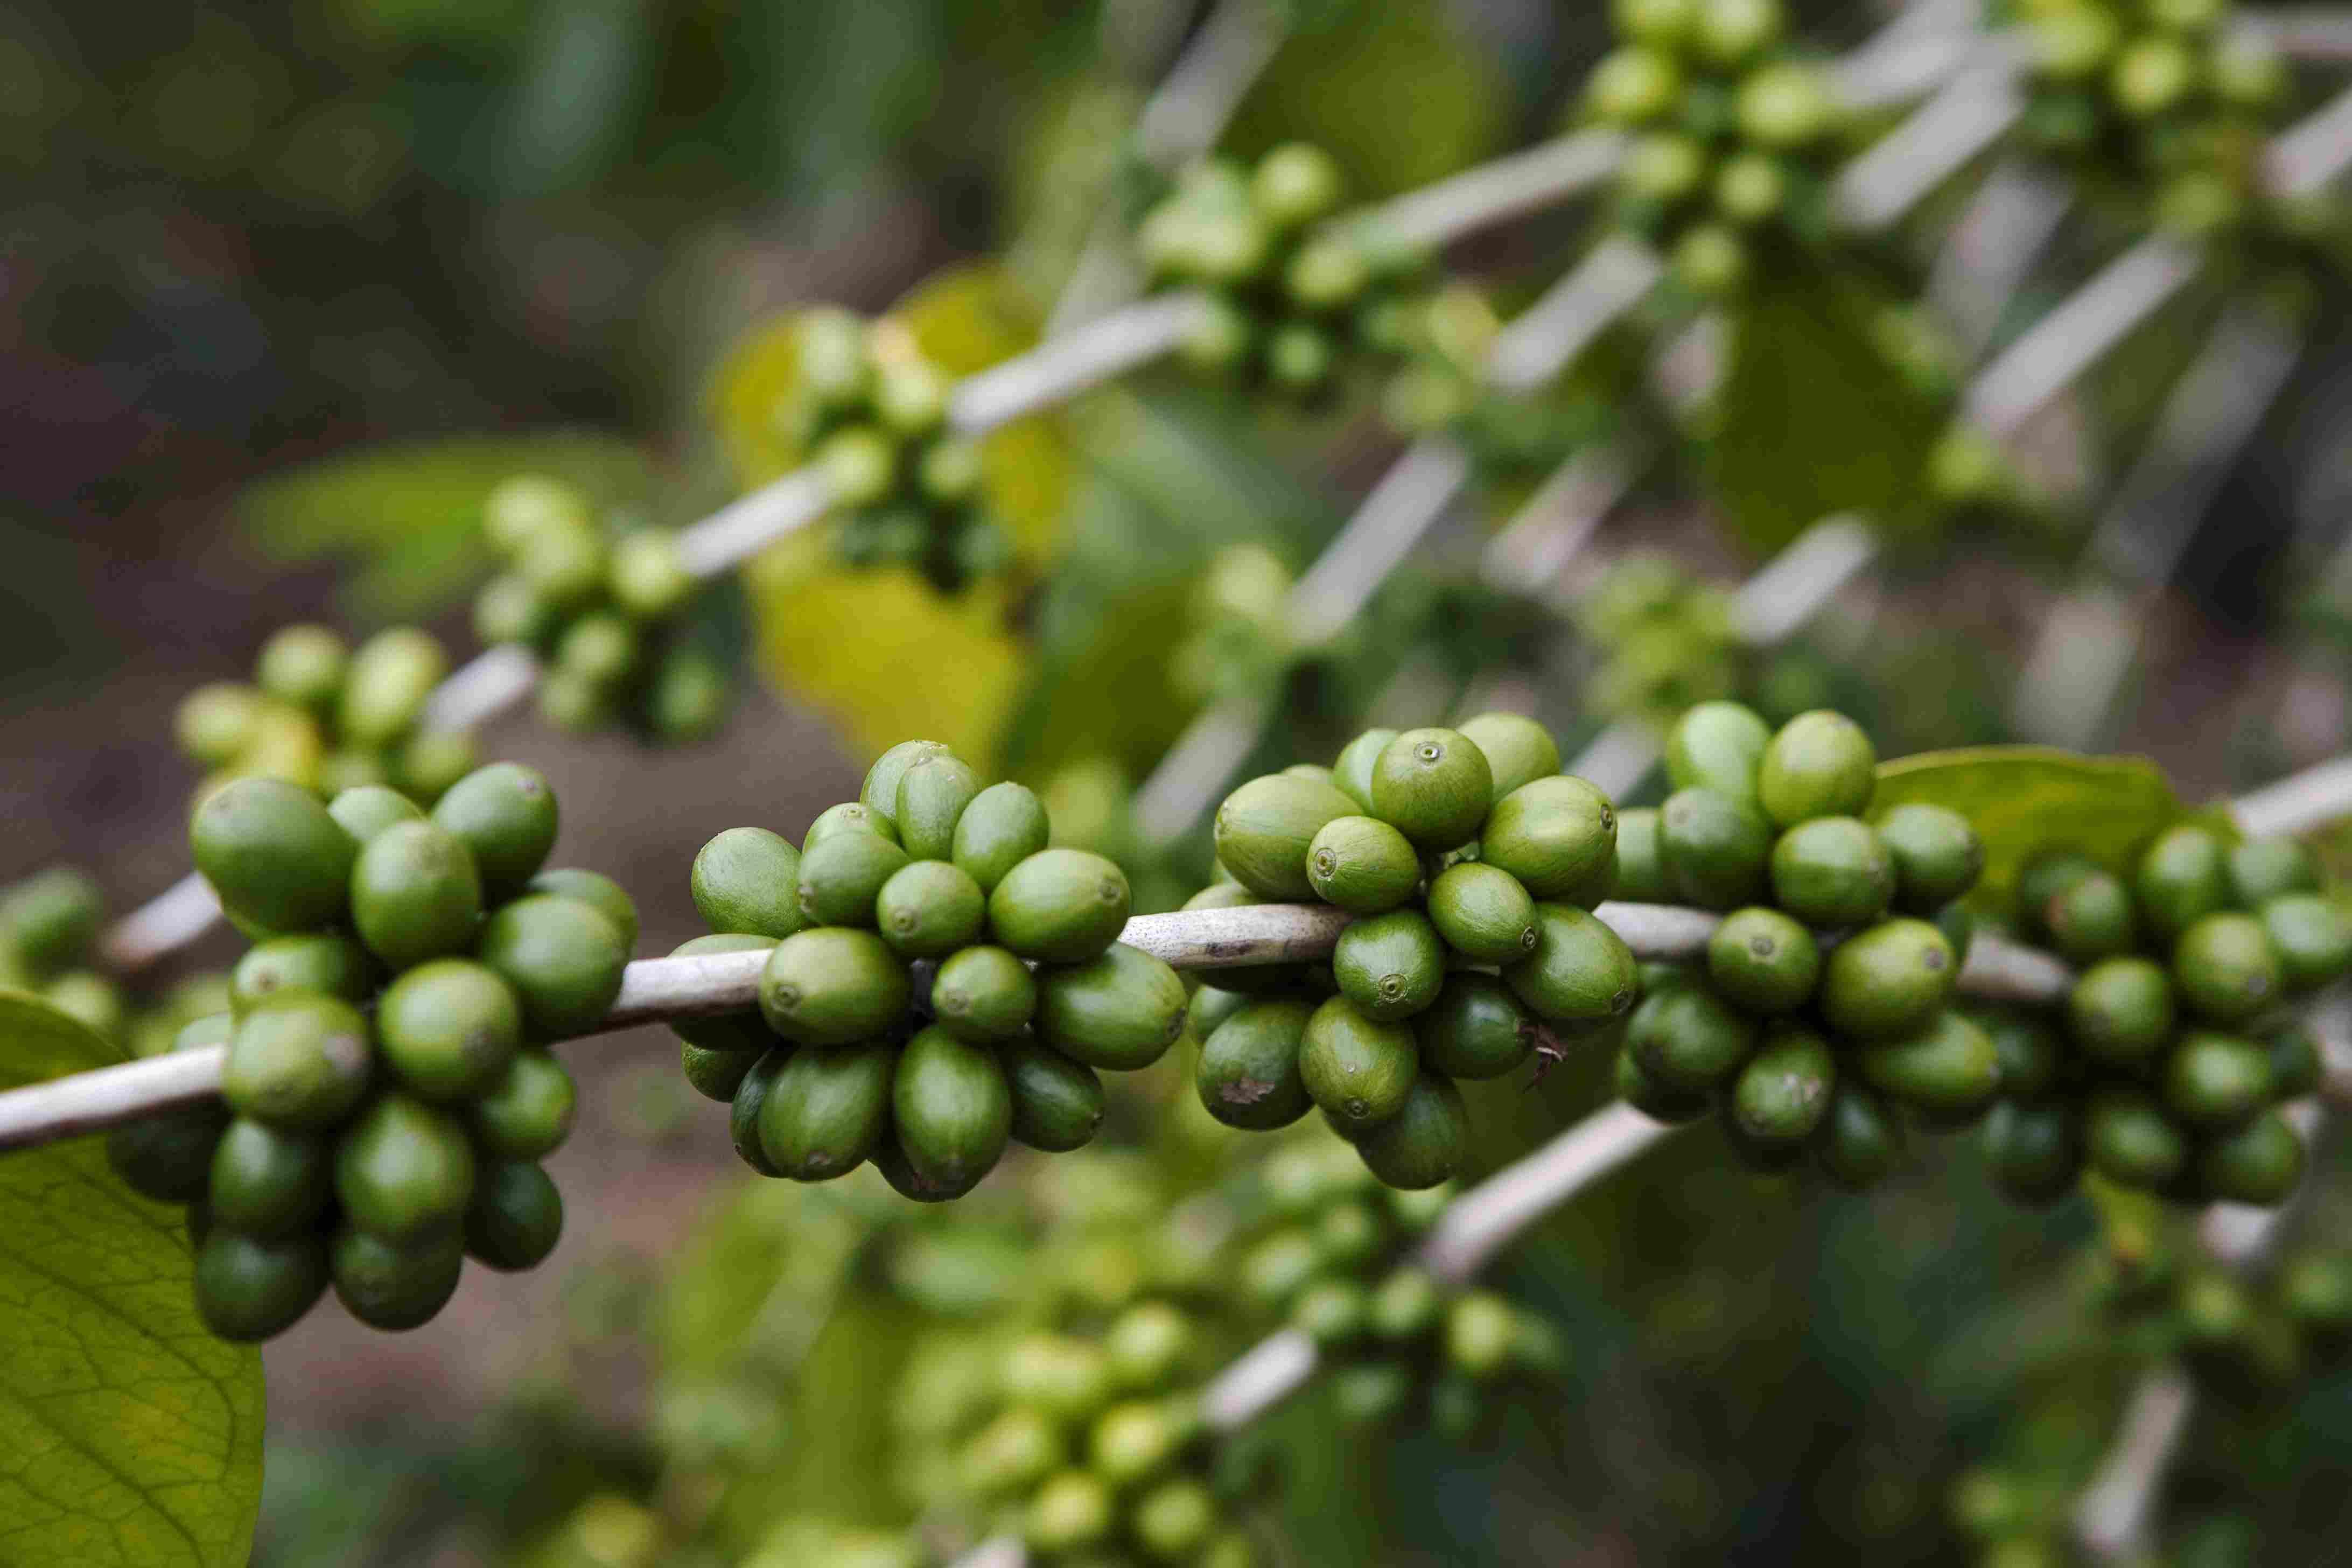 Kona coffee cherries on a tree